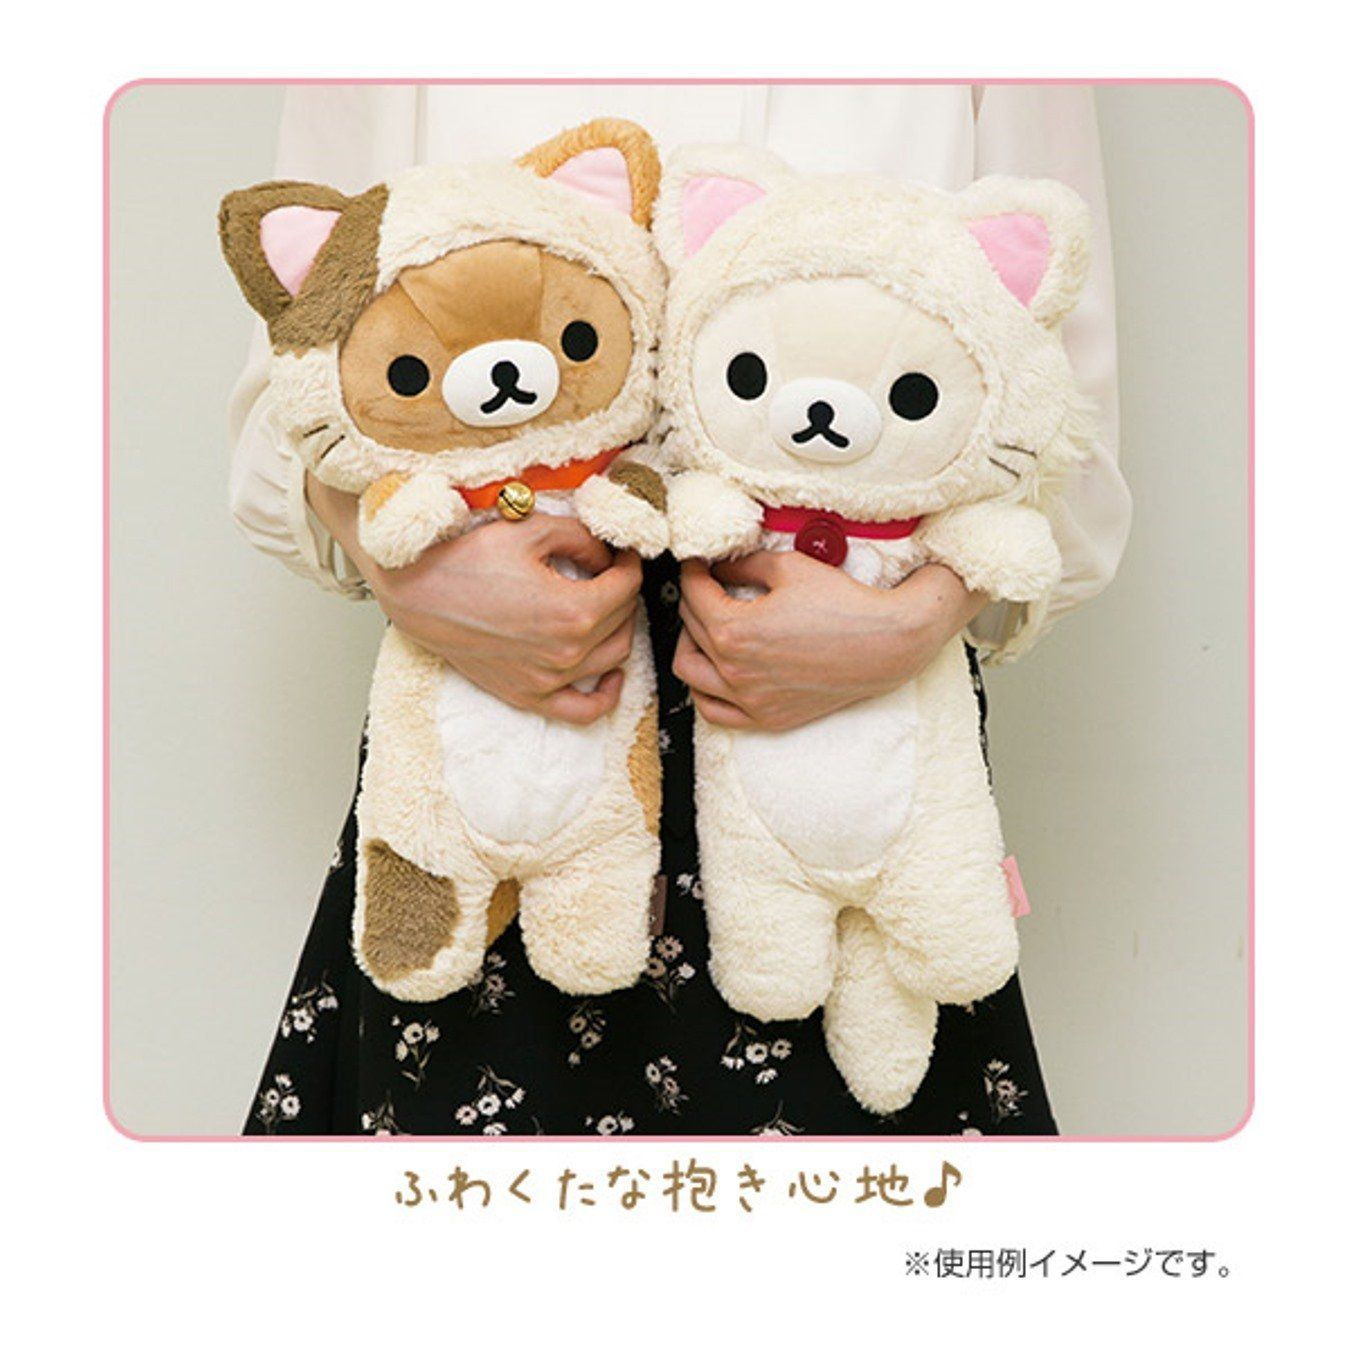 Relax Jomon San-X Rilakkuma collected stuffed animals